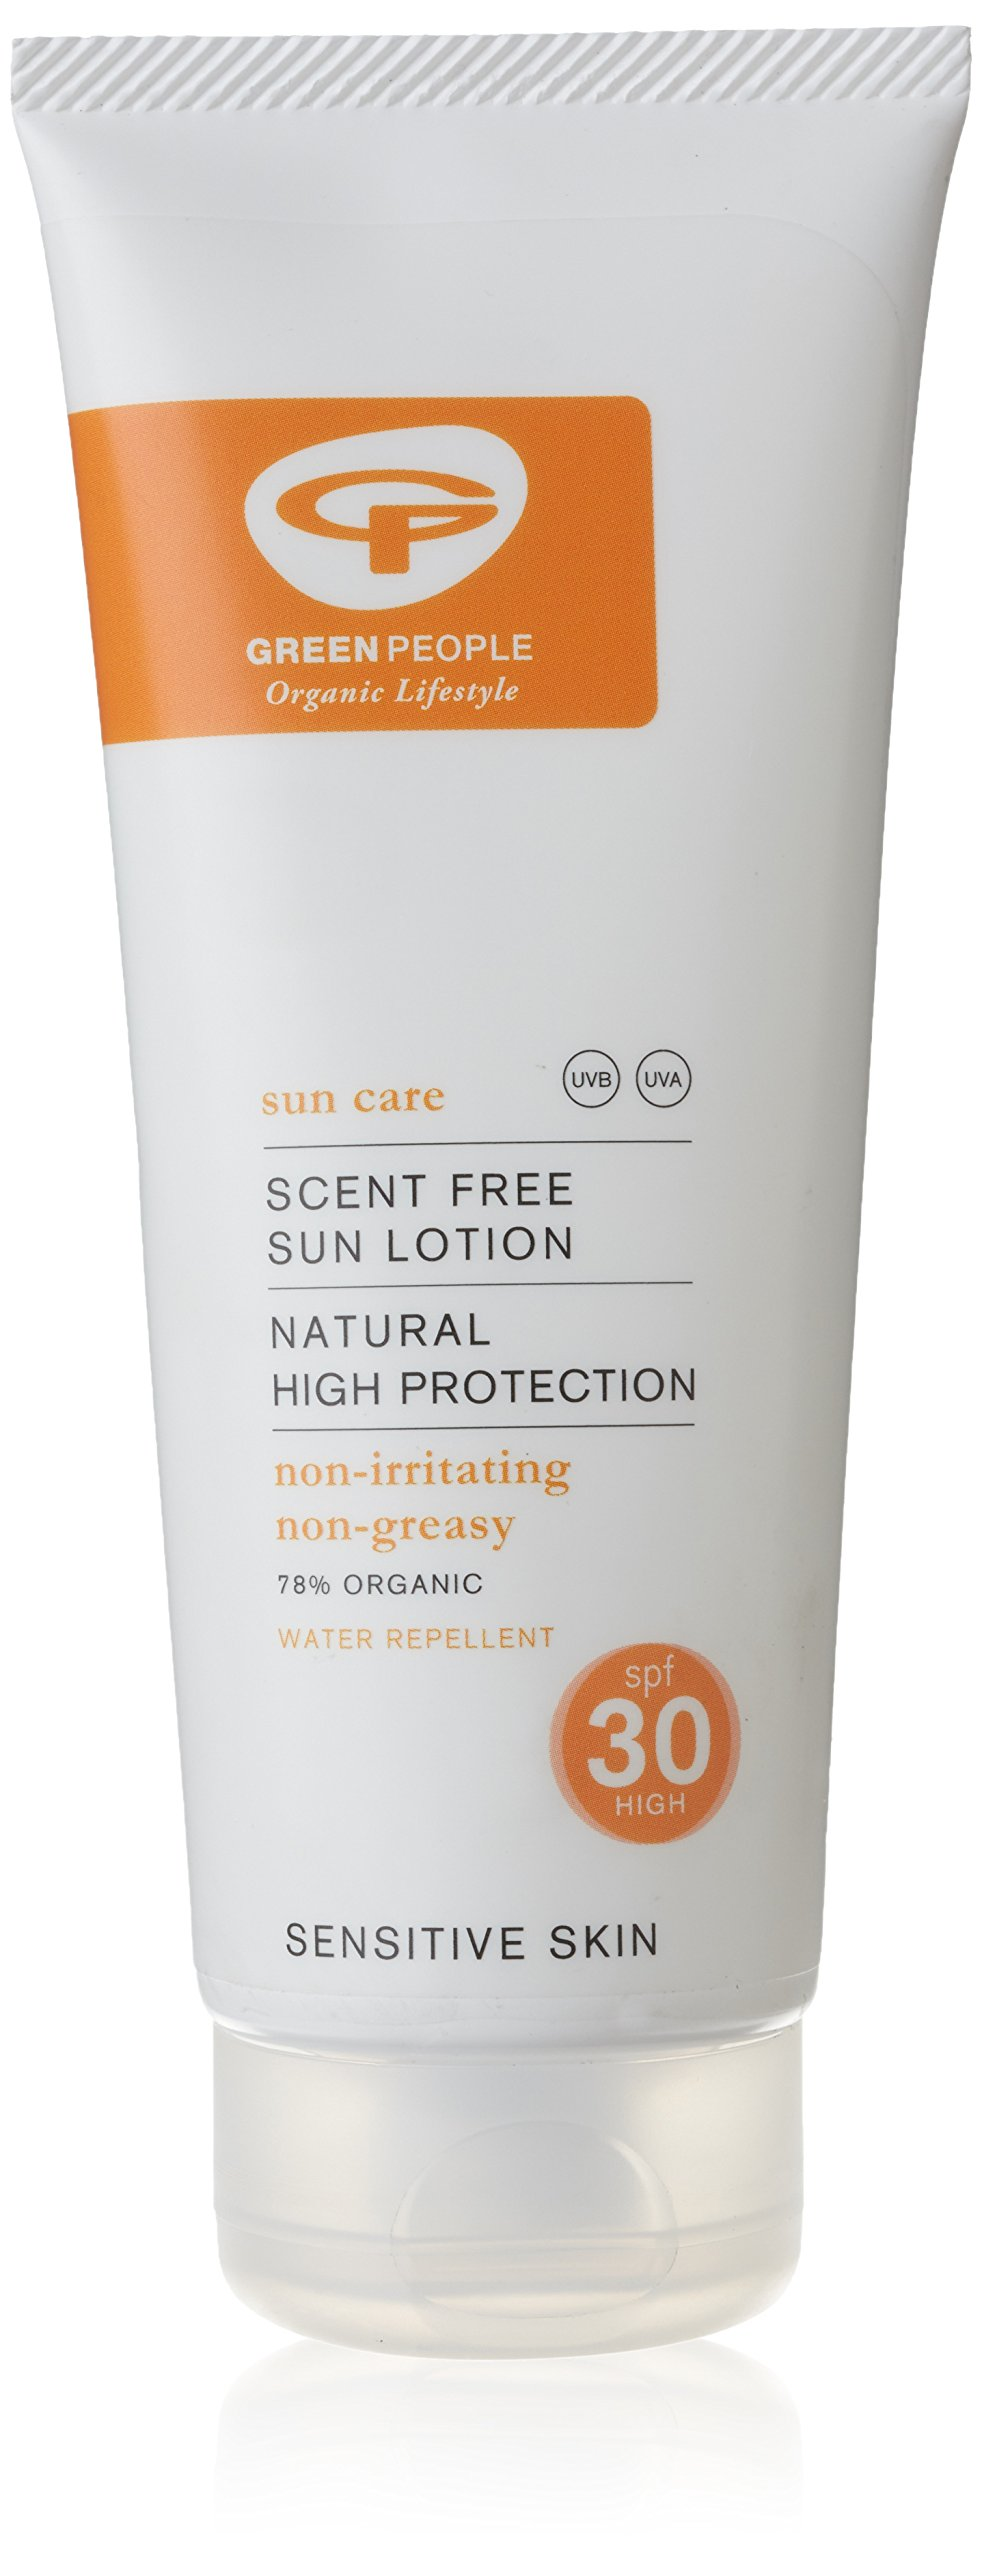 6107f733579 Green People Organic Sun Lotion SPF30 Scent Free 200ml product image